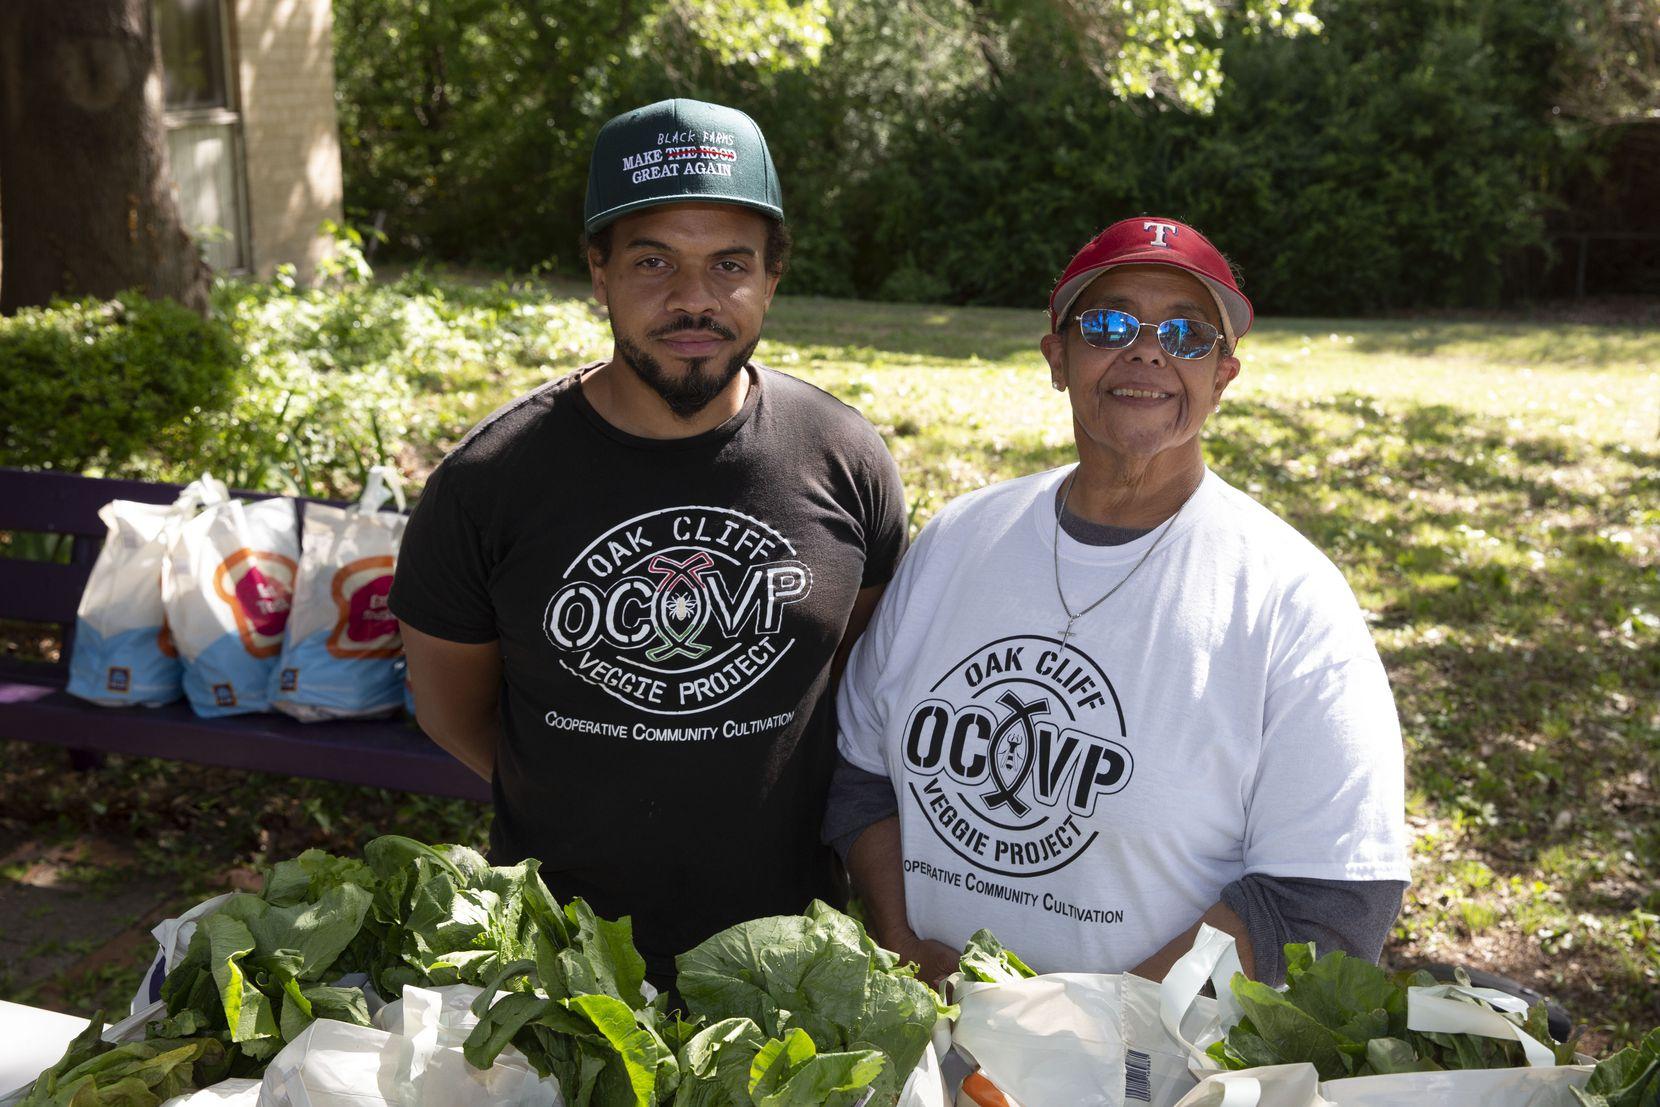 Ples Montgomery and mother Bettie Montgomery of non-profit Oak Cliff Veggie Project